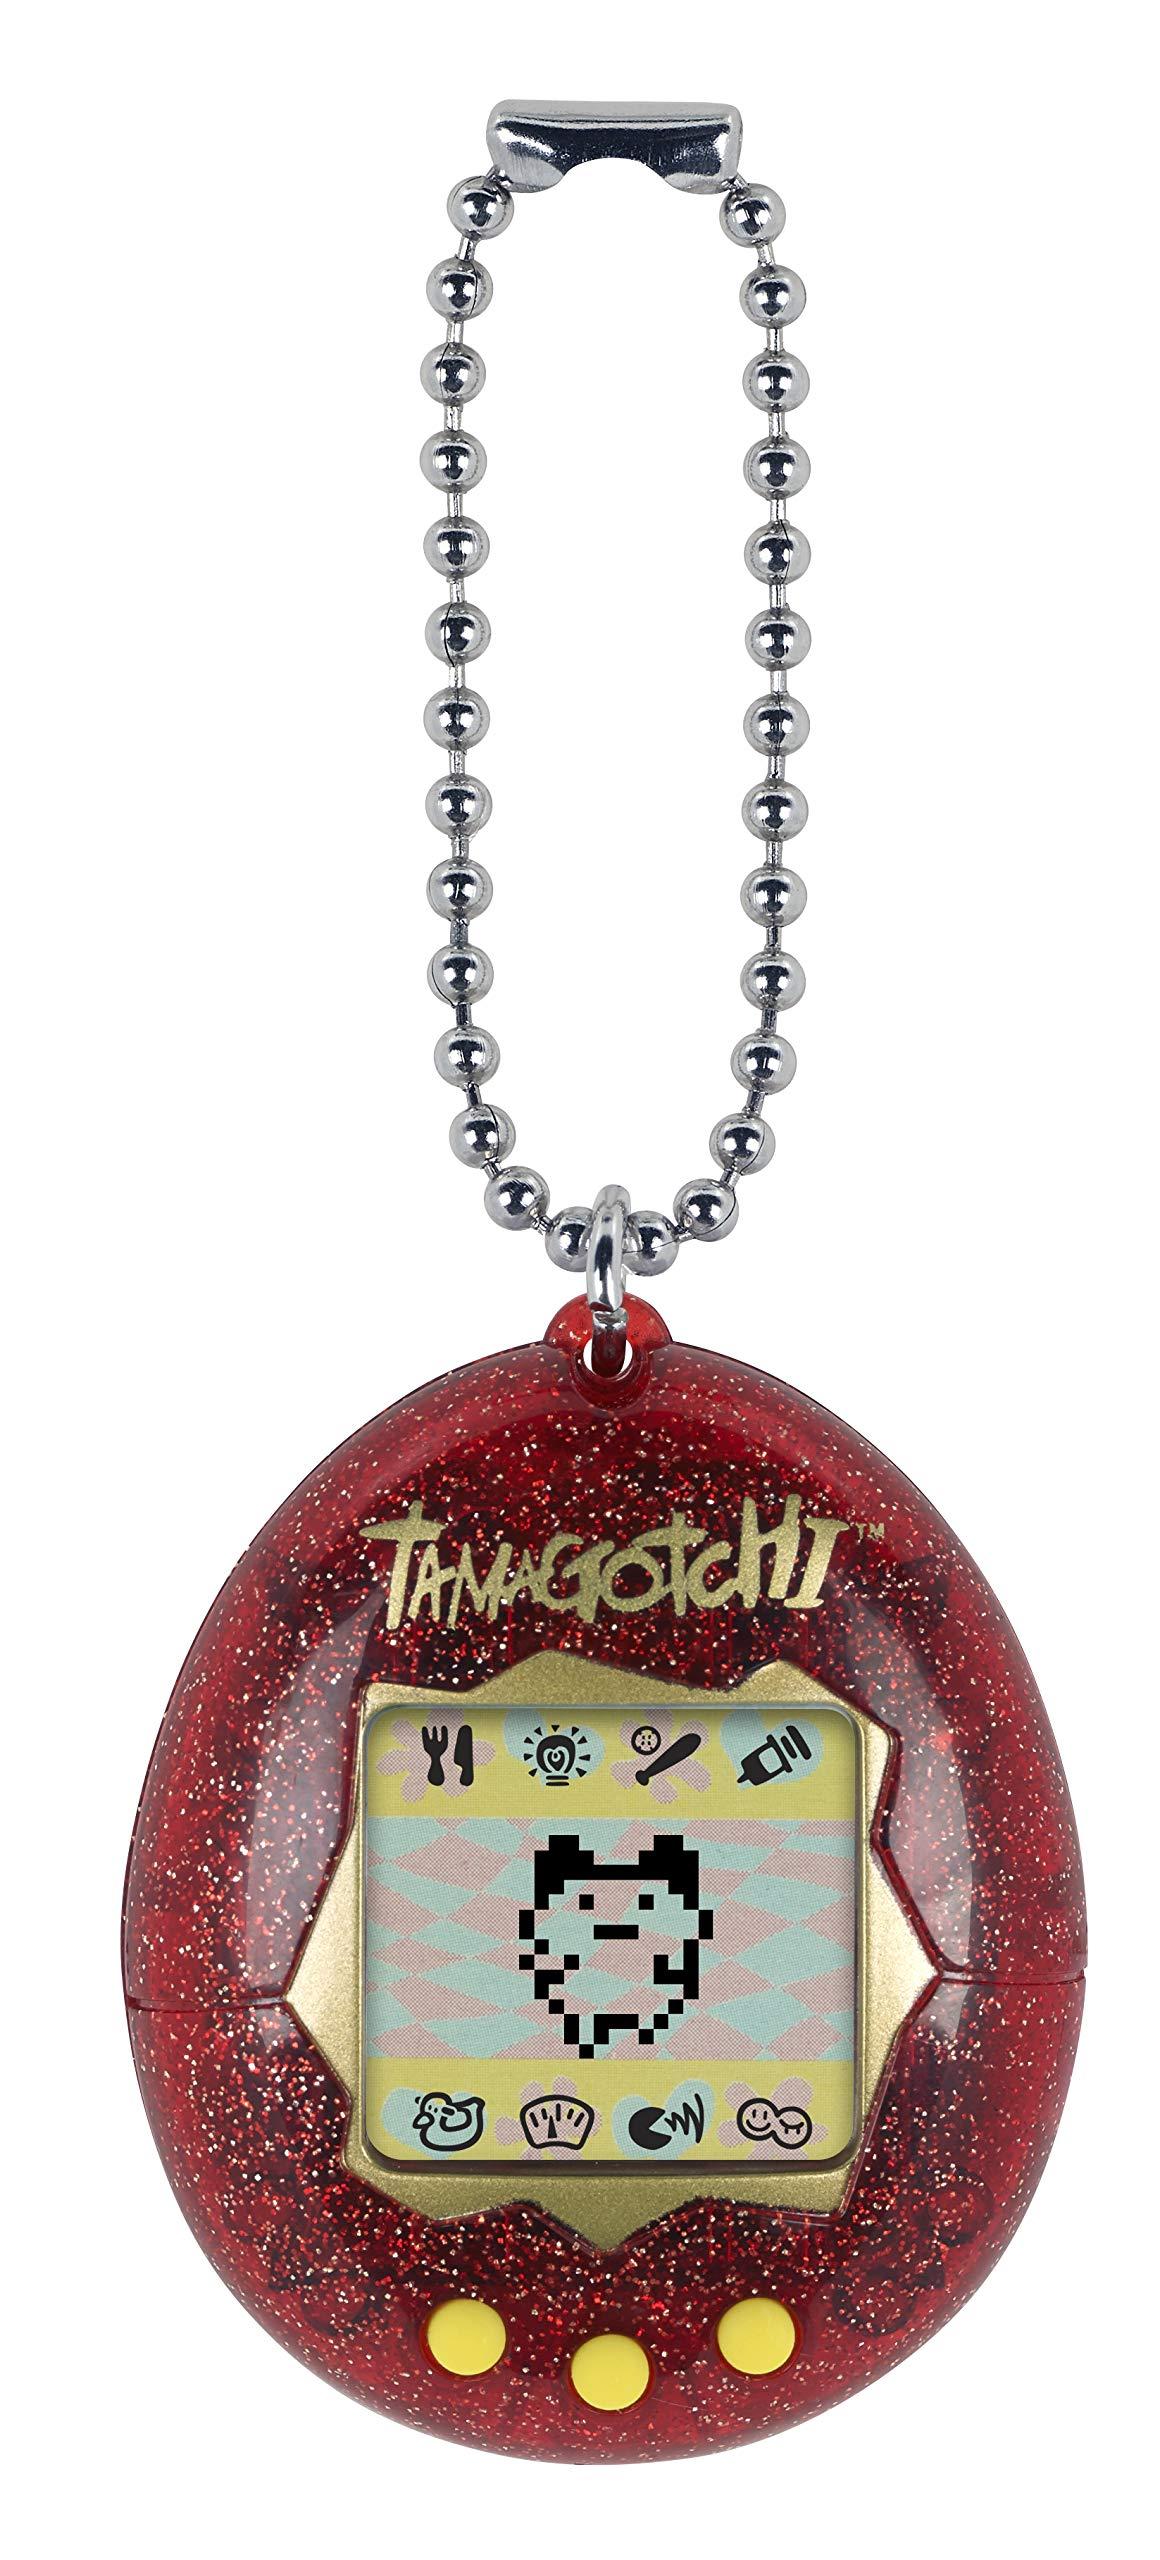 Tamagotchi Electronic Game, Red Glitter by Tamagotchi (Image #1)